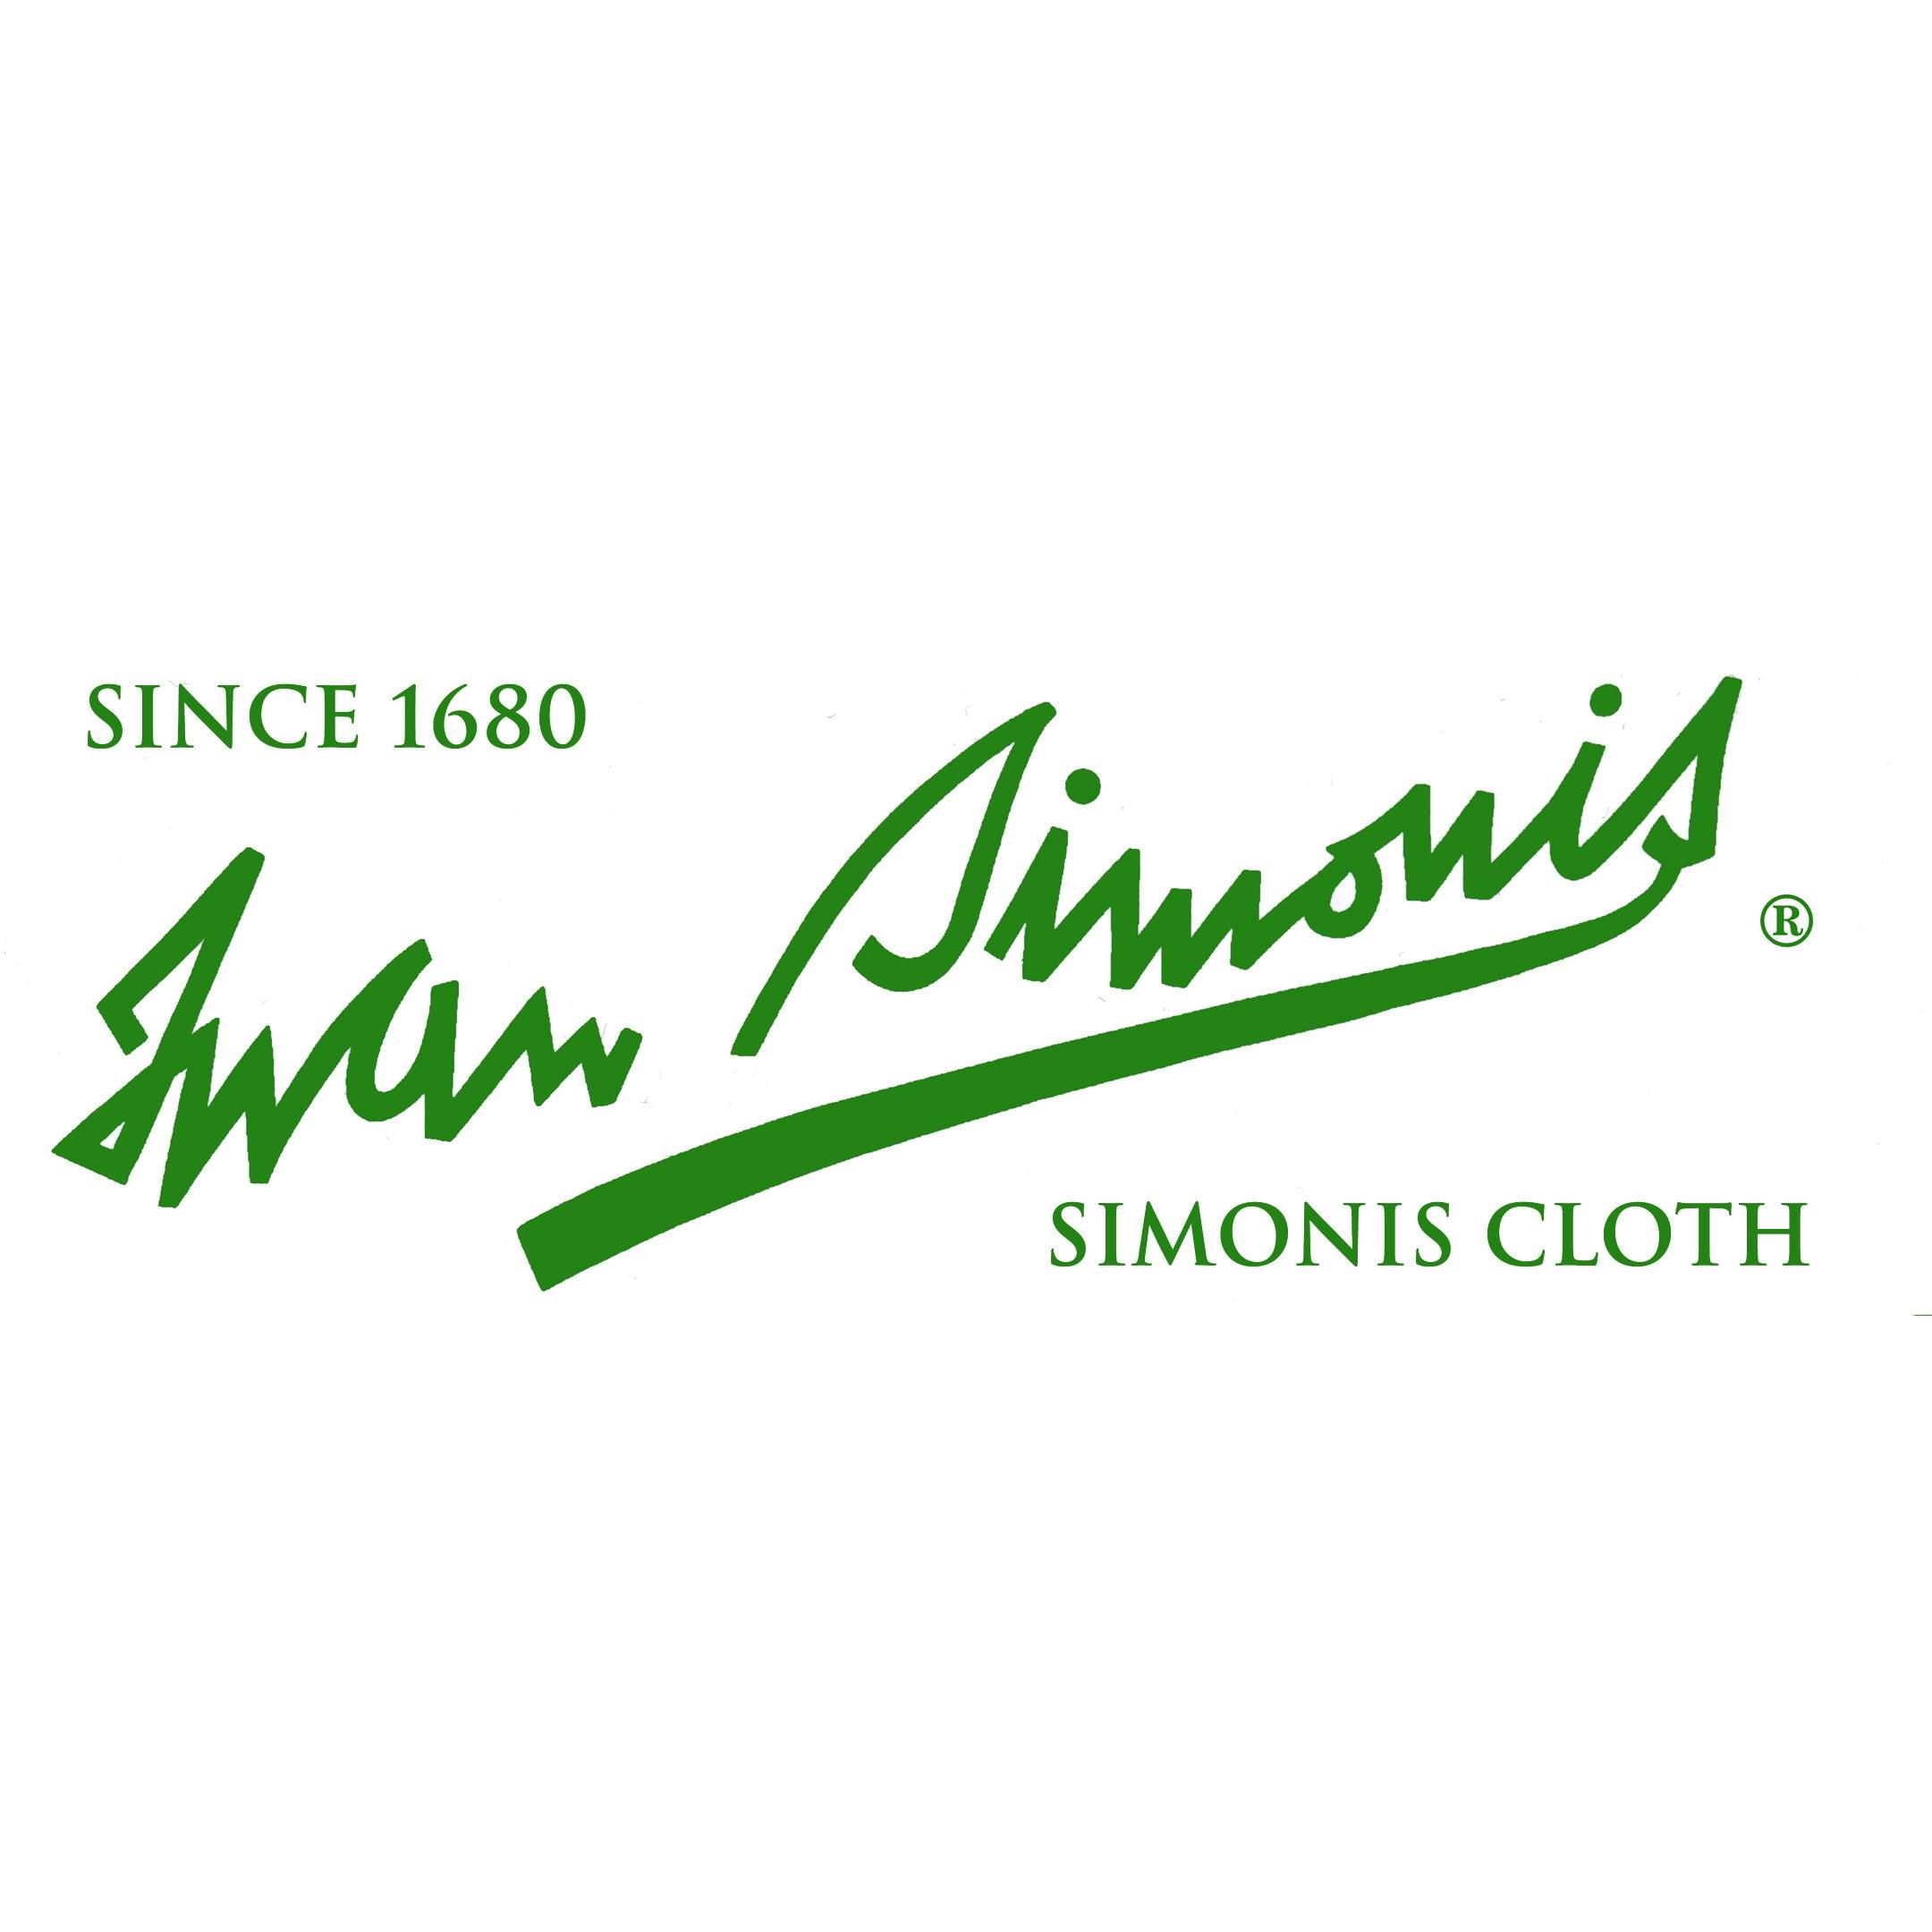 IWAN SIMONIS S. A.